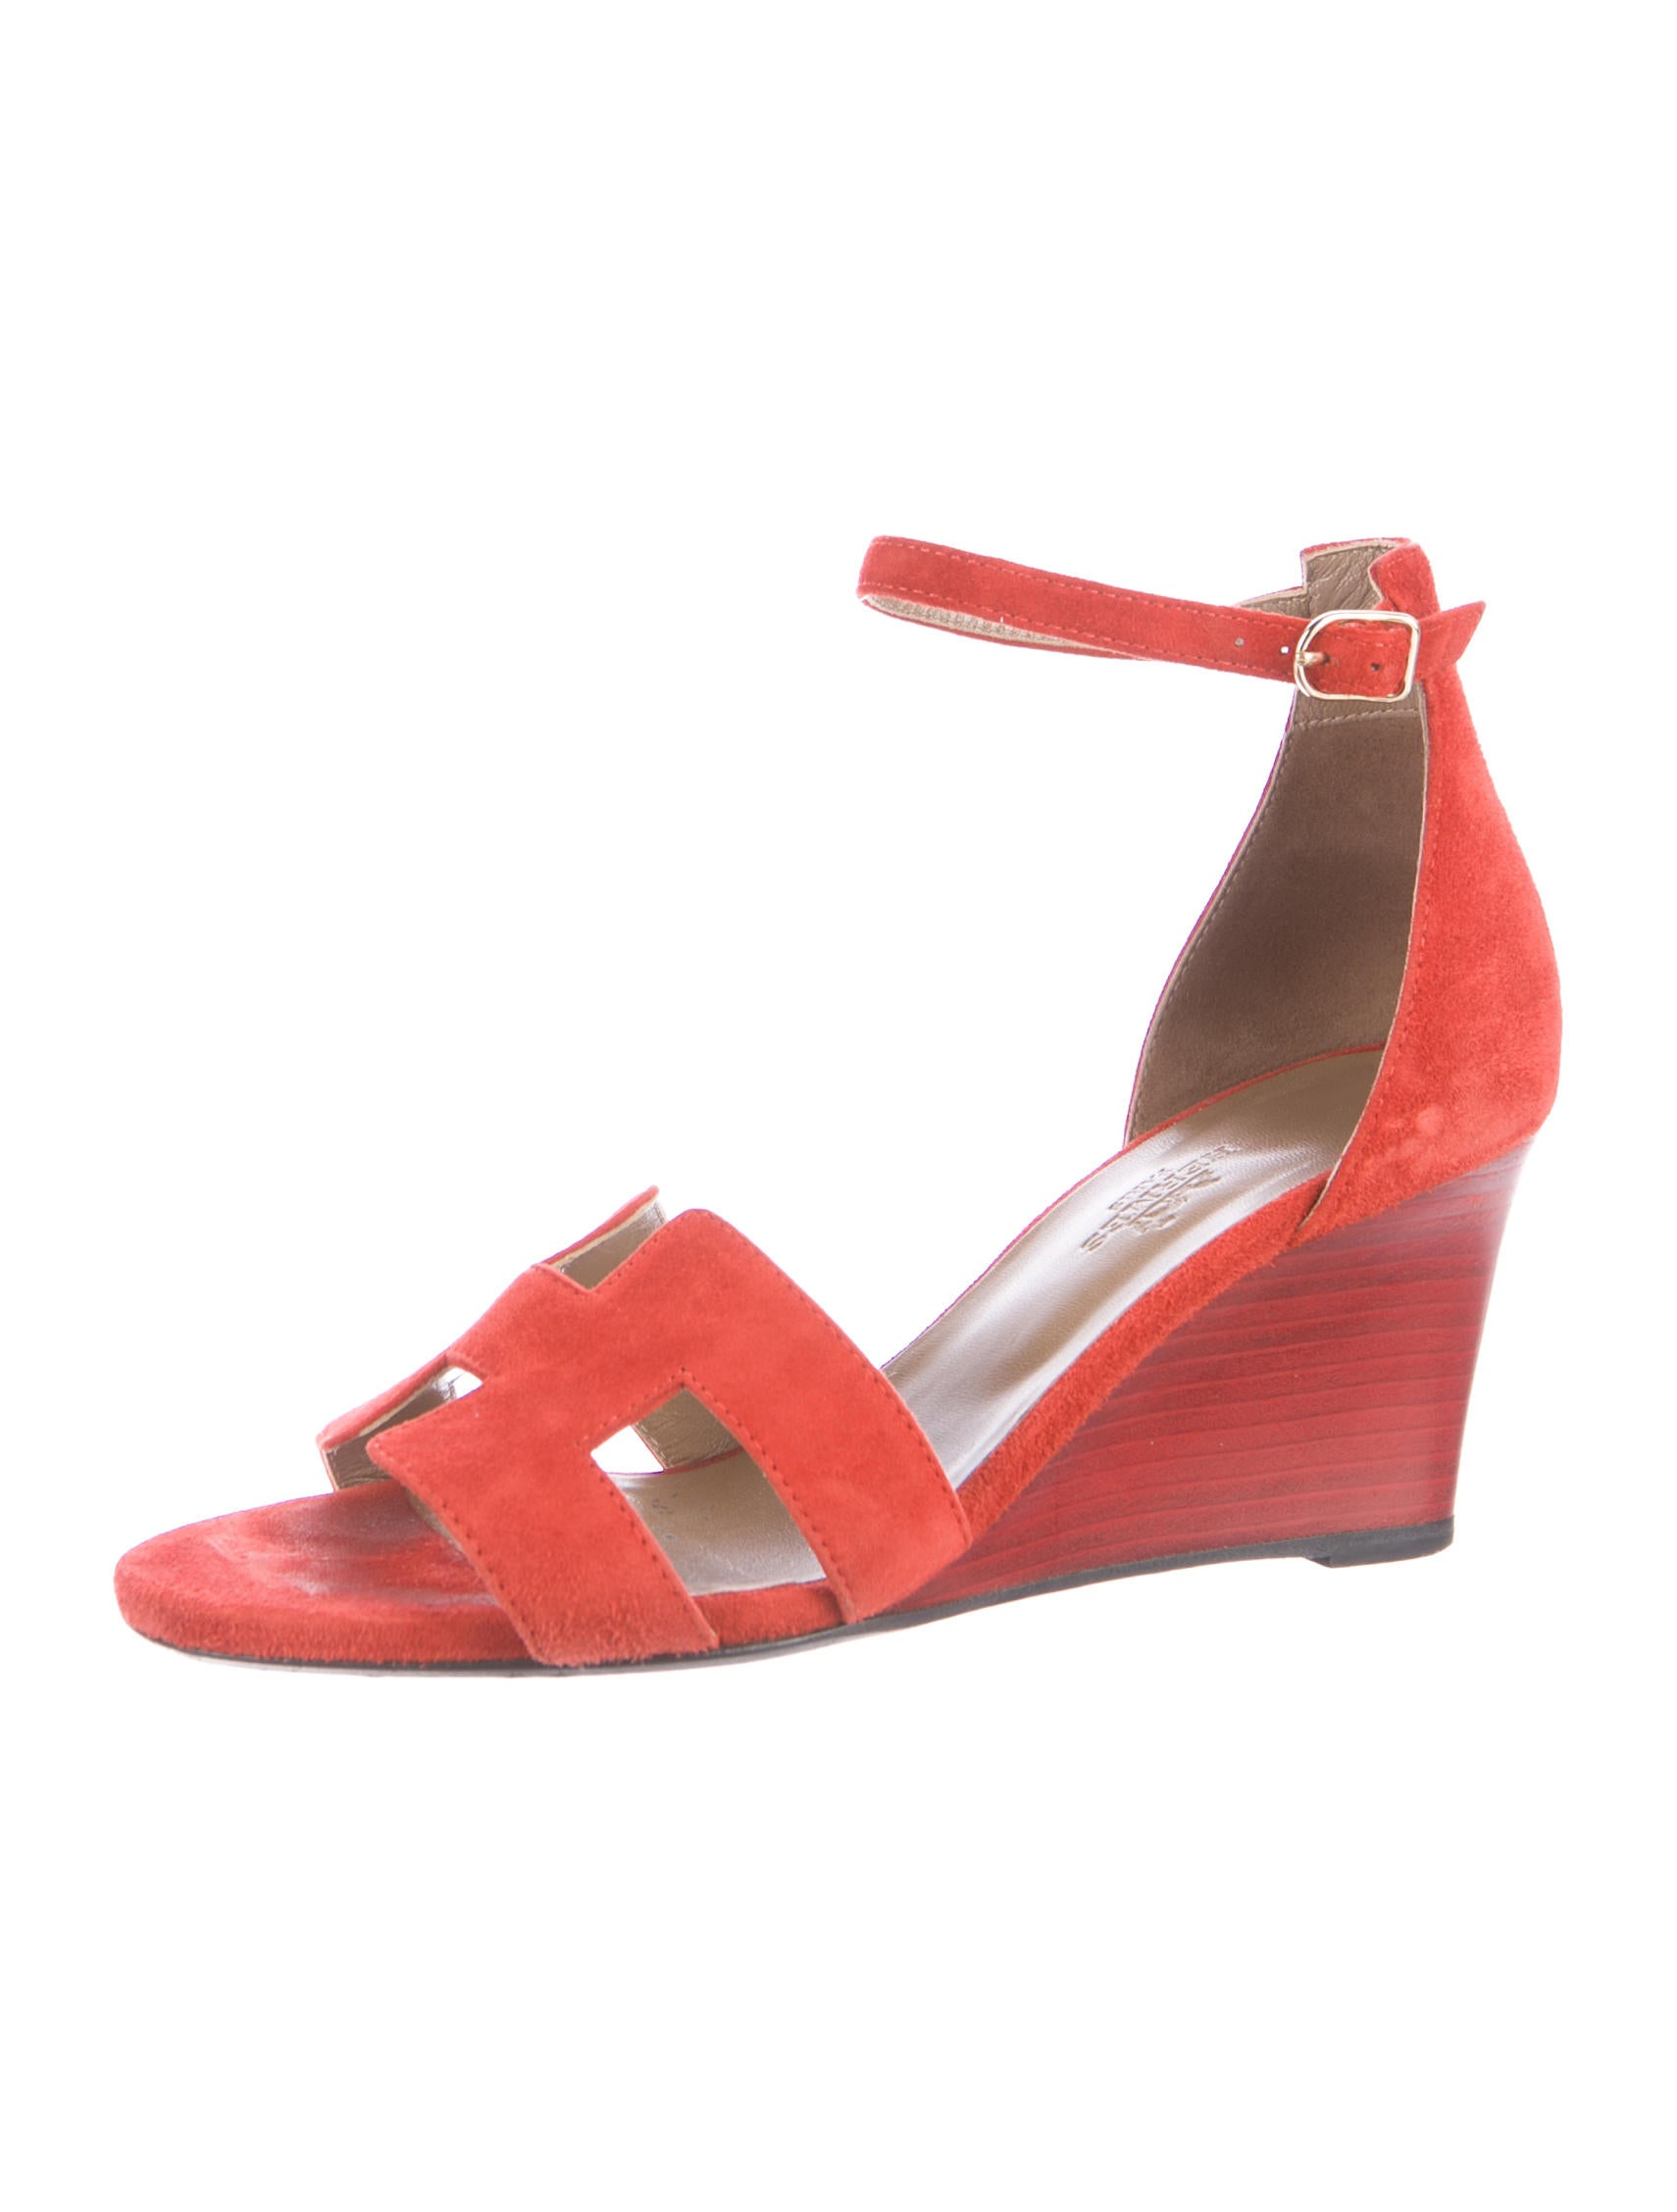 hermes women shoes - photo #46